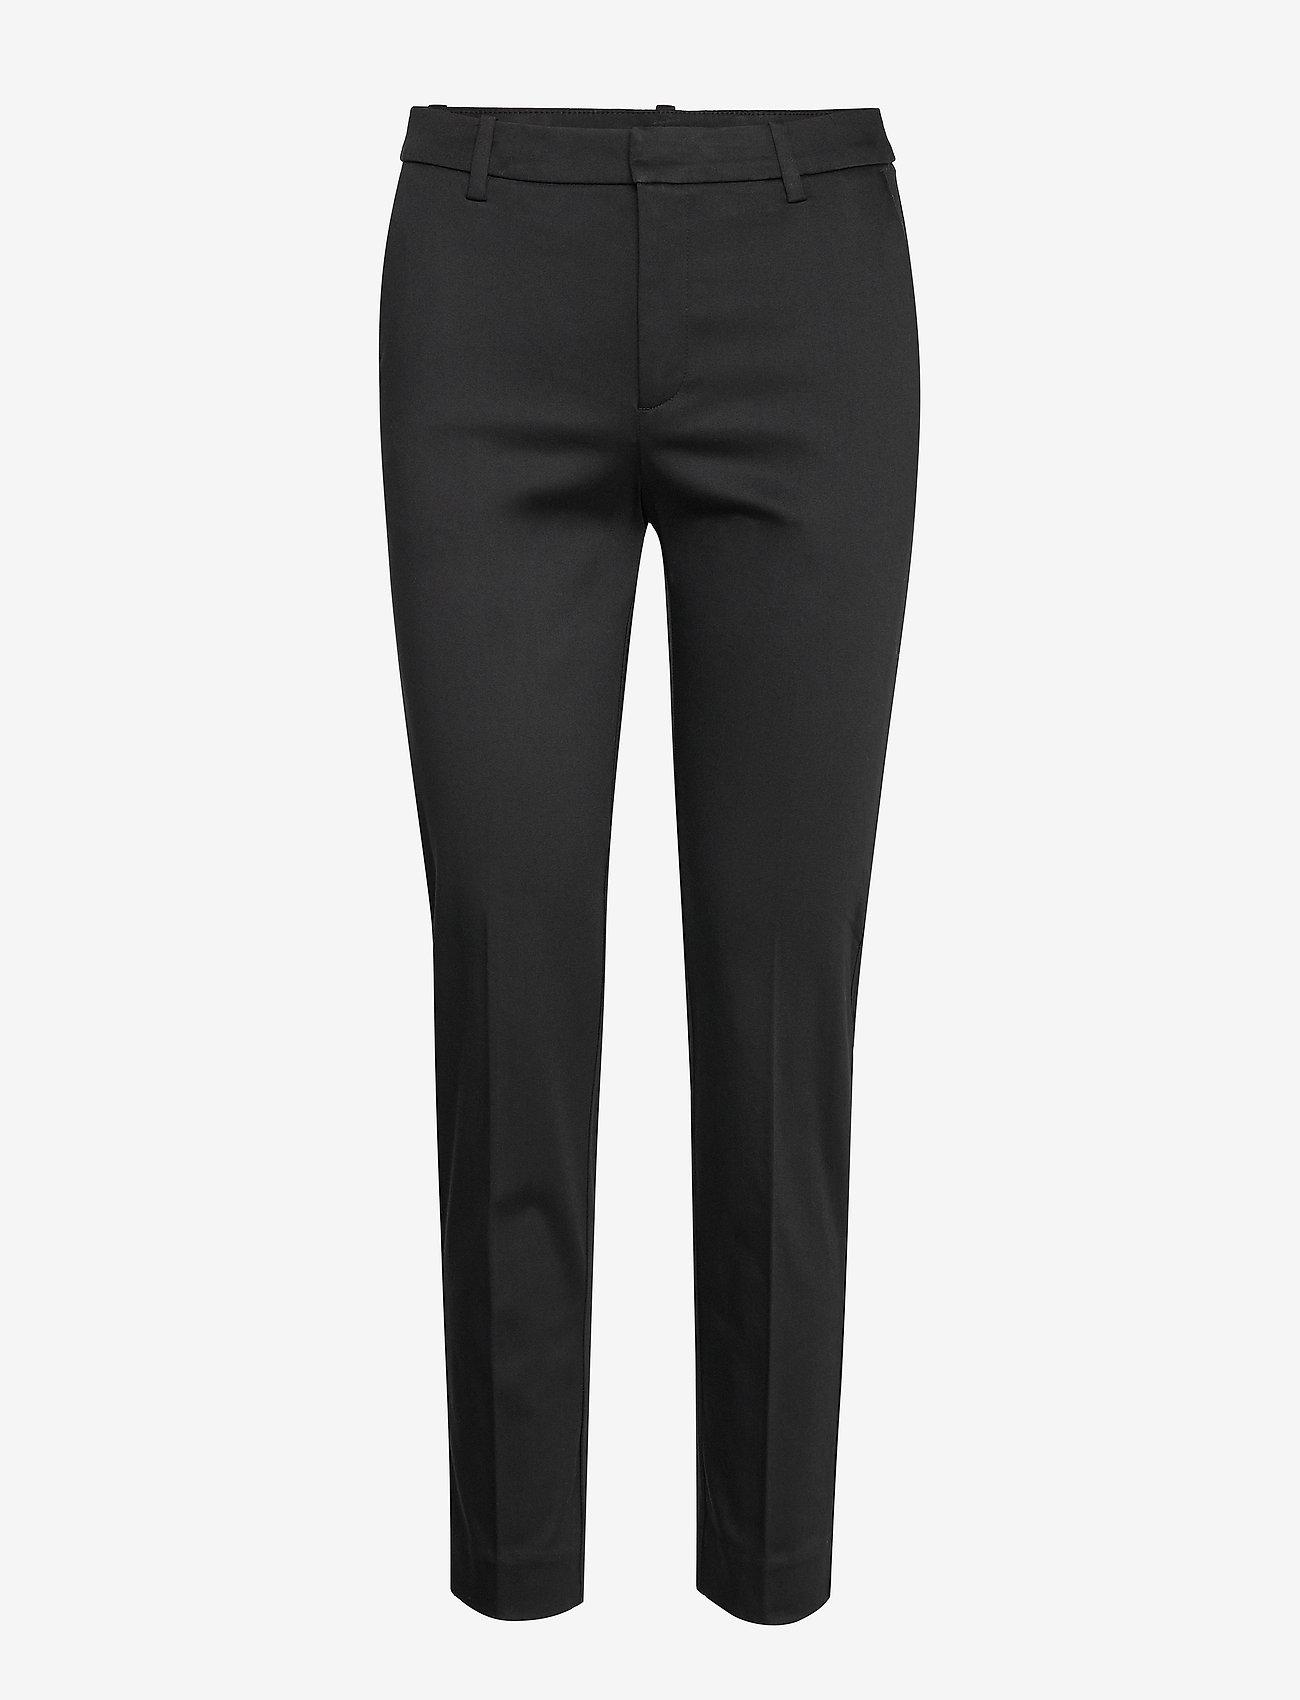 Trousers Iris (Black) (279.30 kr) - Lindex